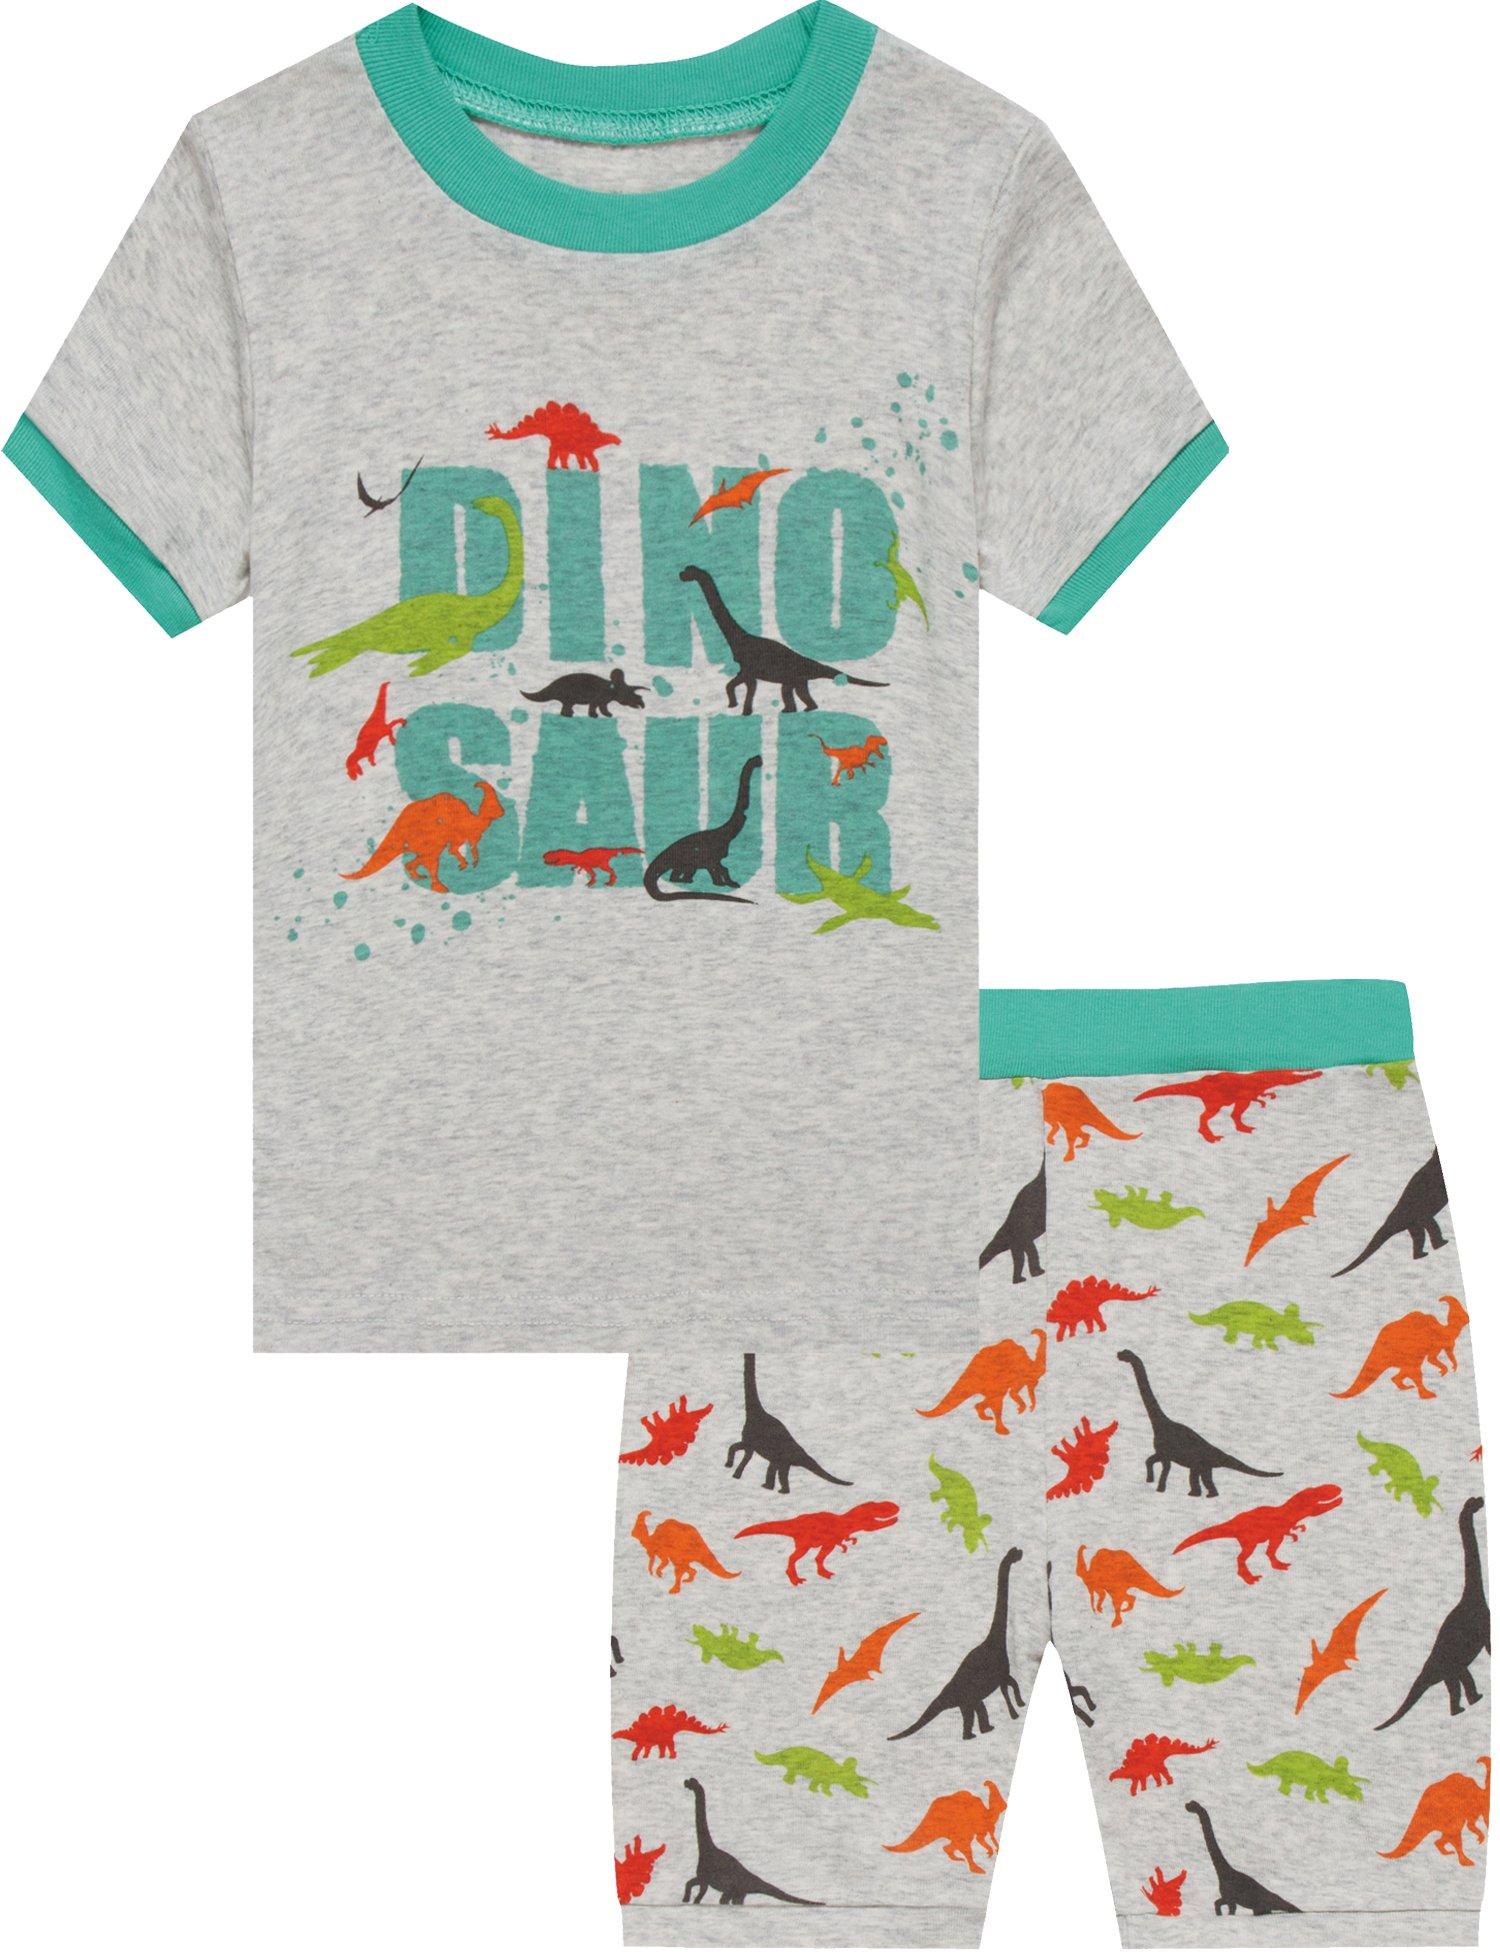 Boys Dinosaur Pajamas Shorts T Shirt & Pants Sets for Kids Cool Summer Children Sleepwear PJ Size 2T